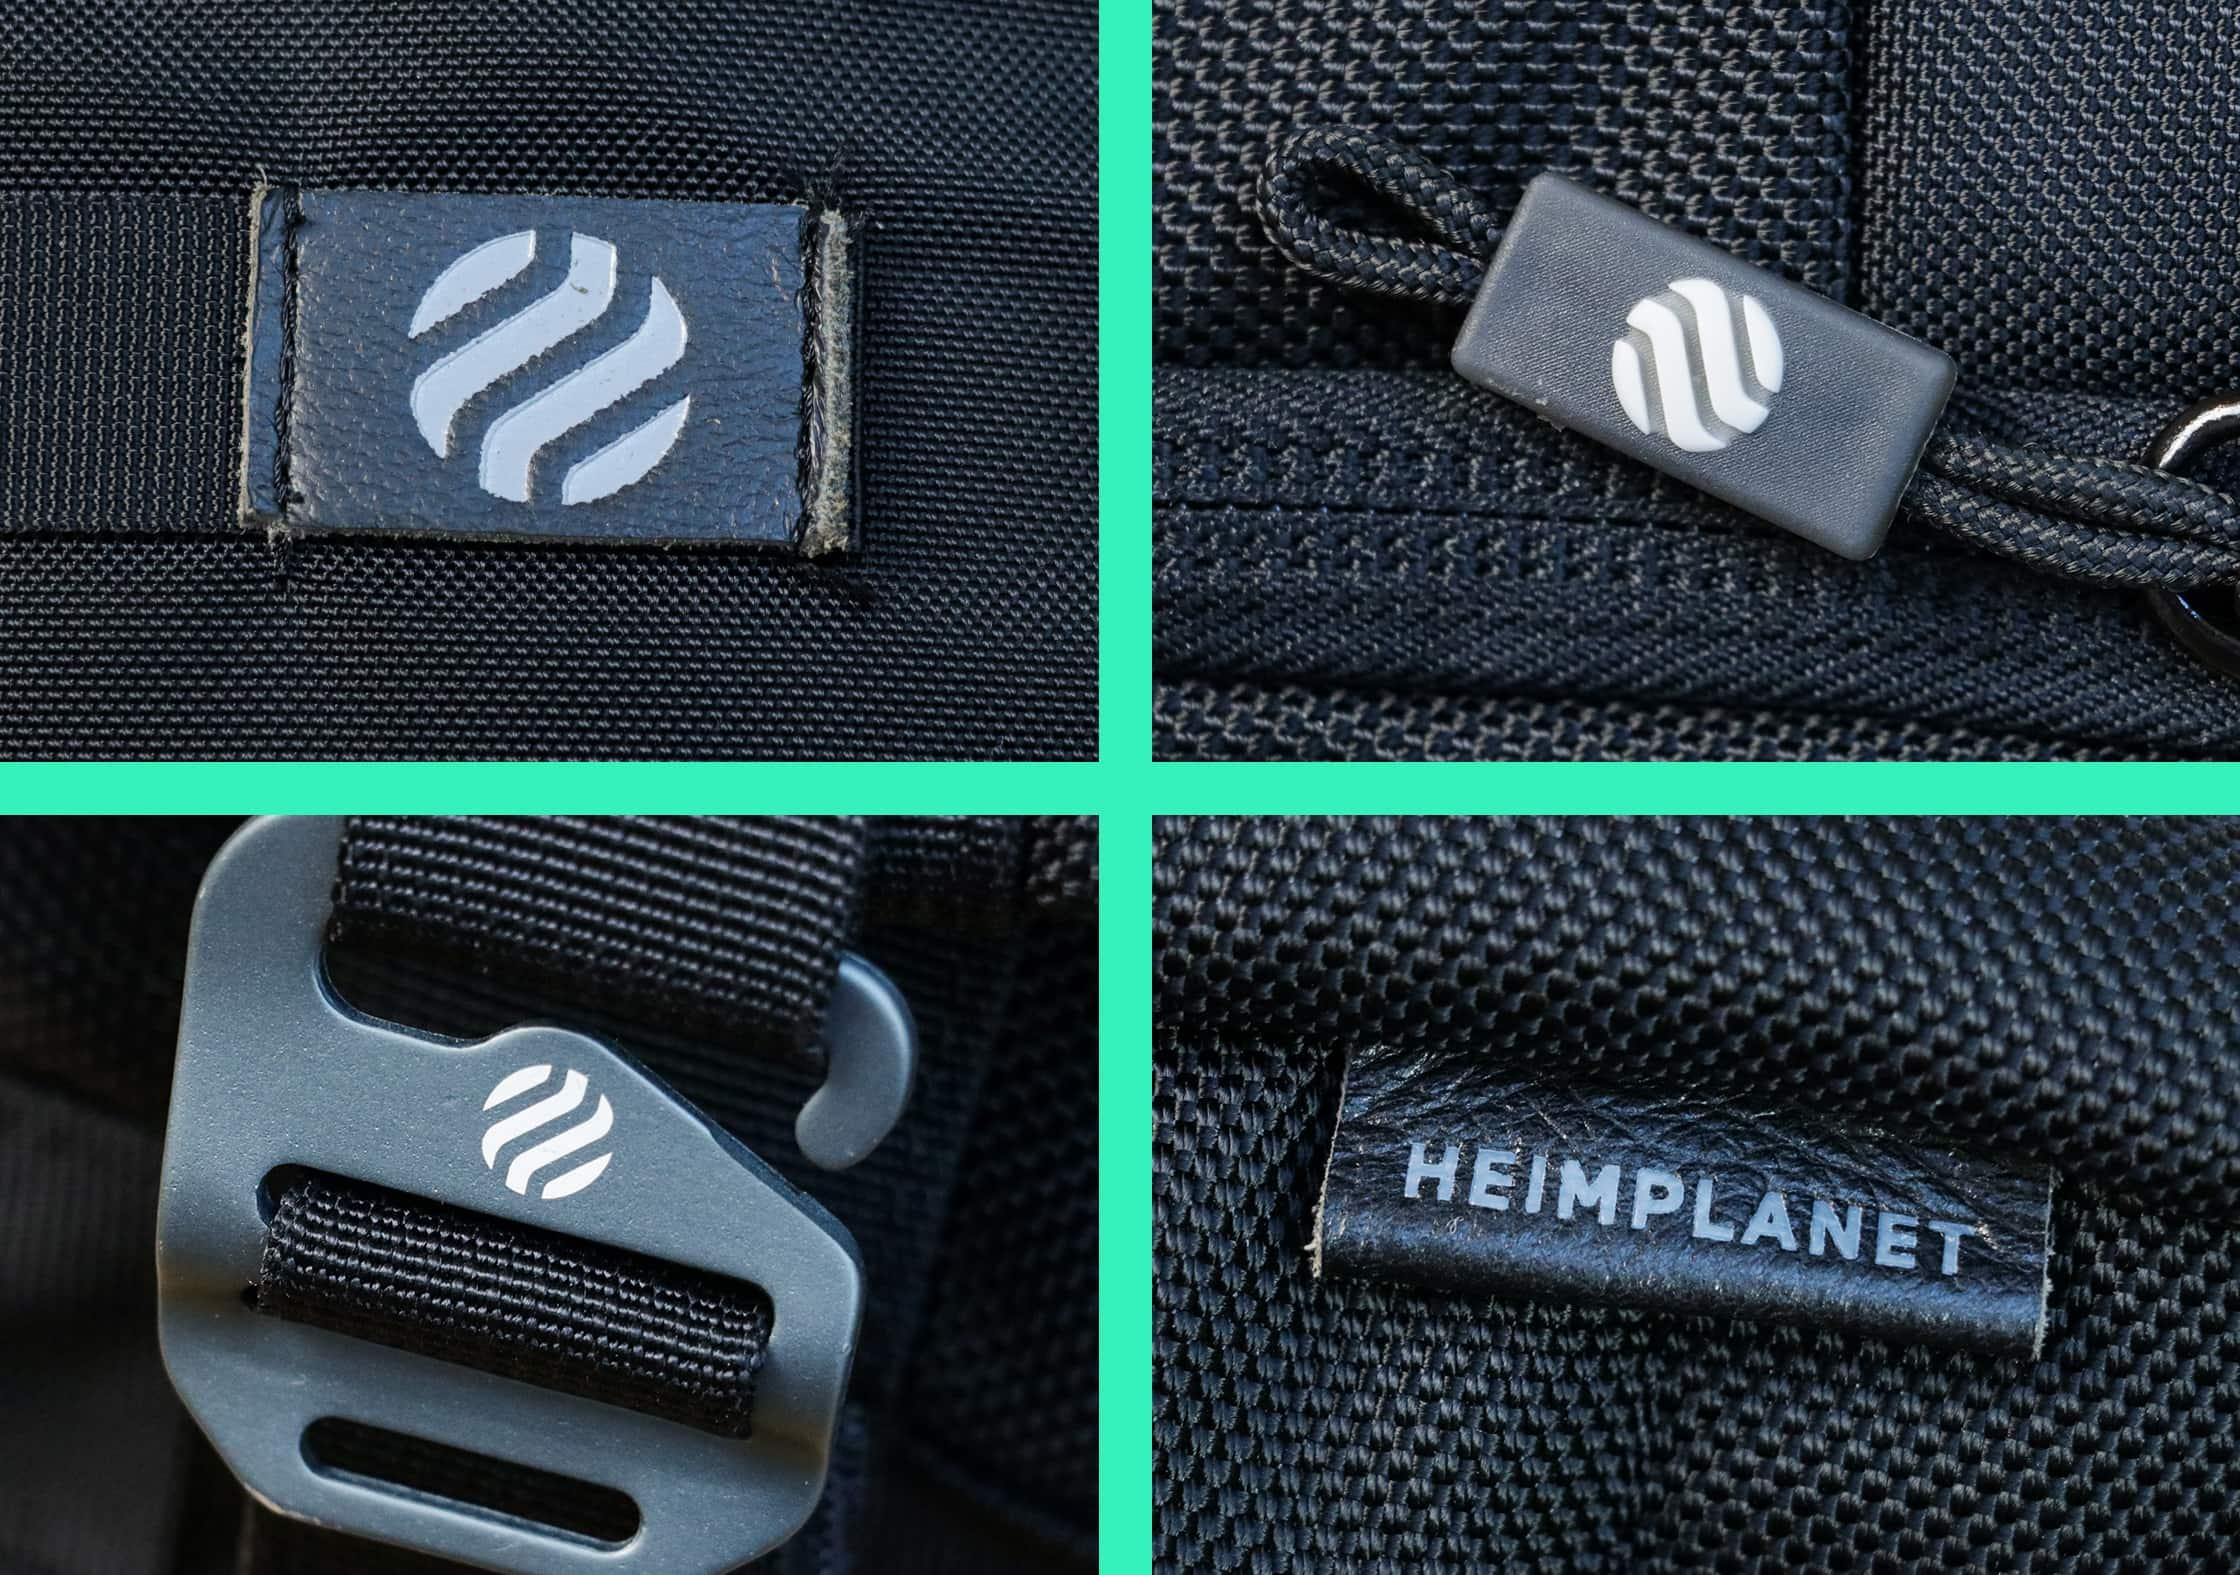 Branding On The Heimplanet Monolith Weekender